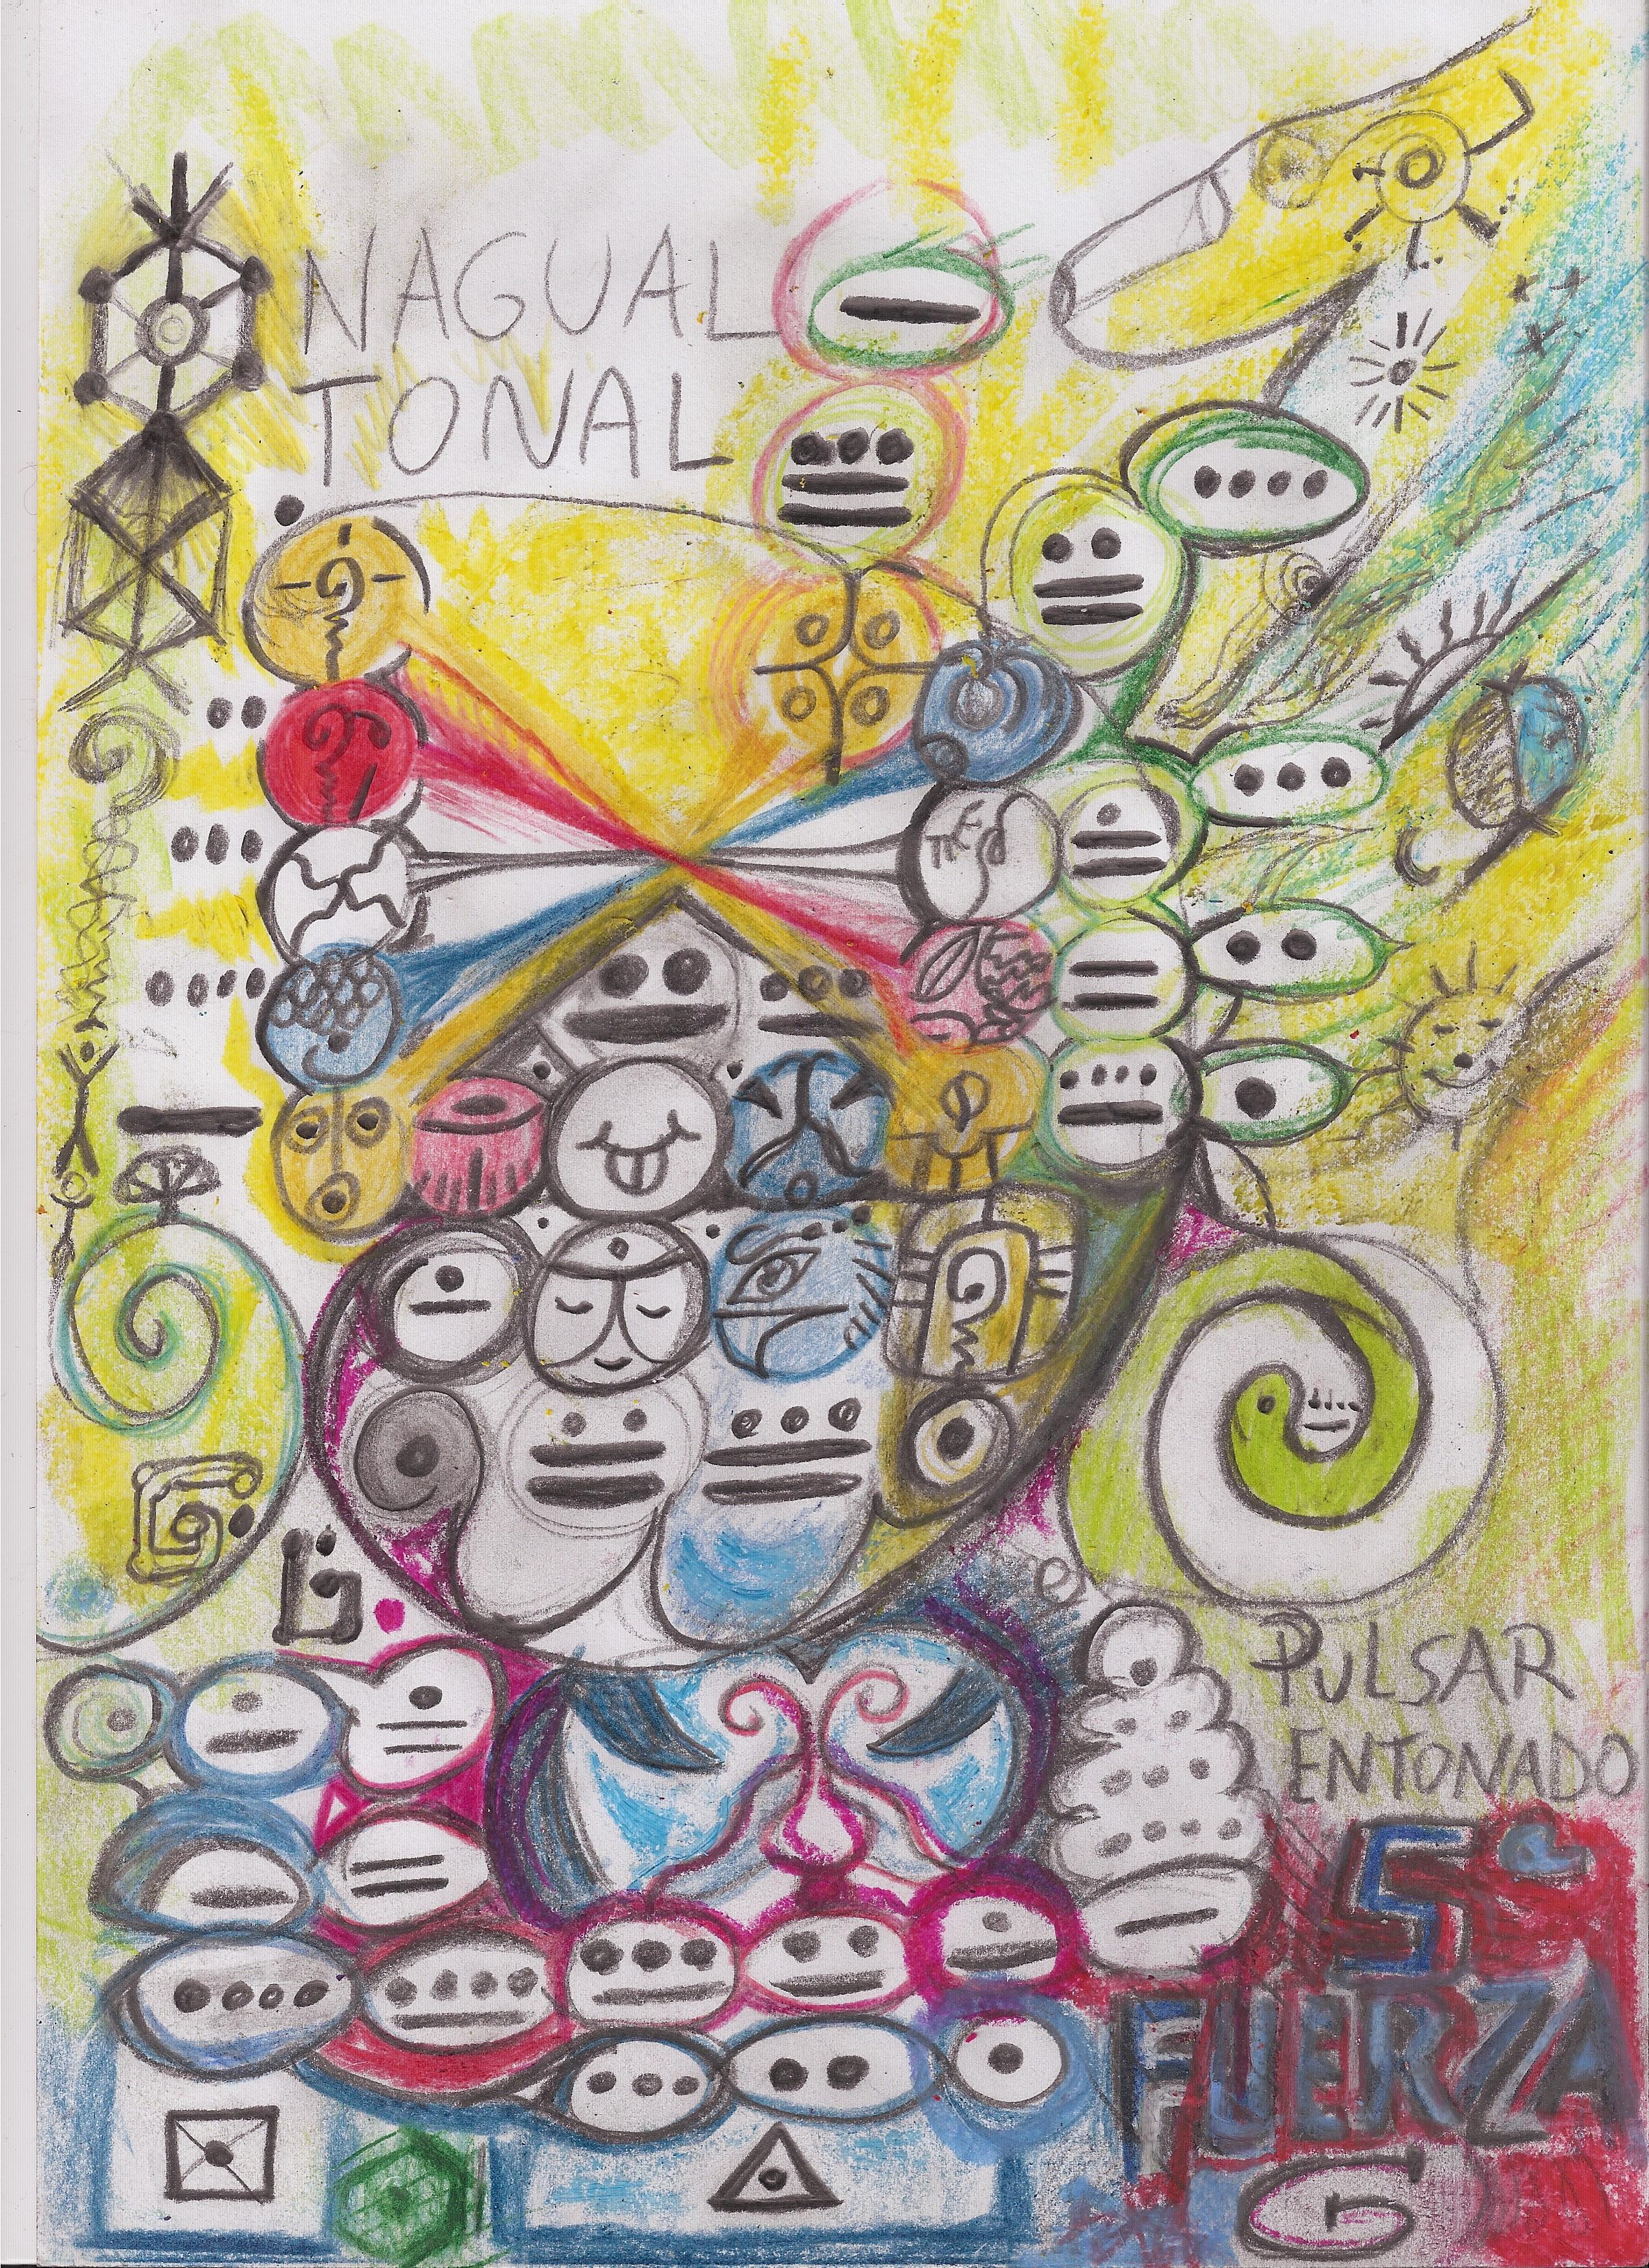 siete generaciones misticas-1